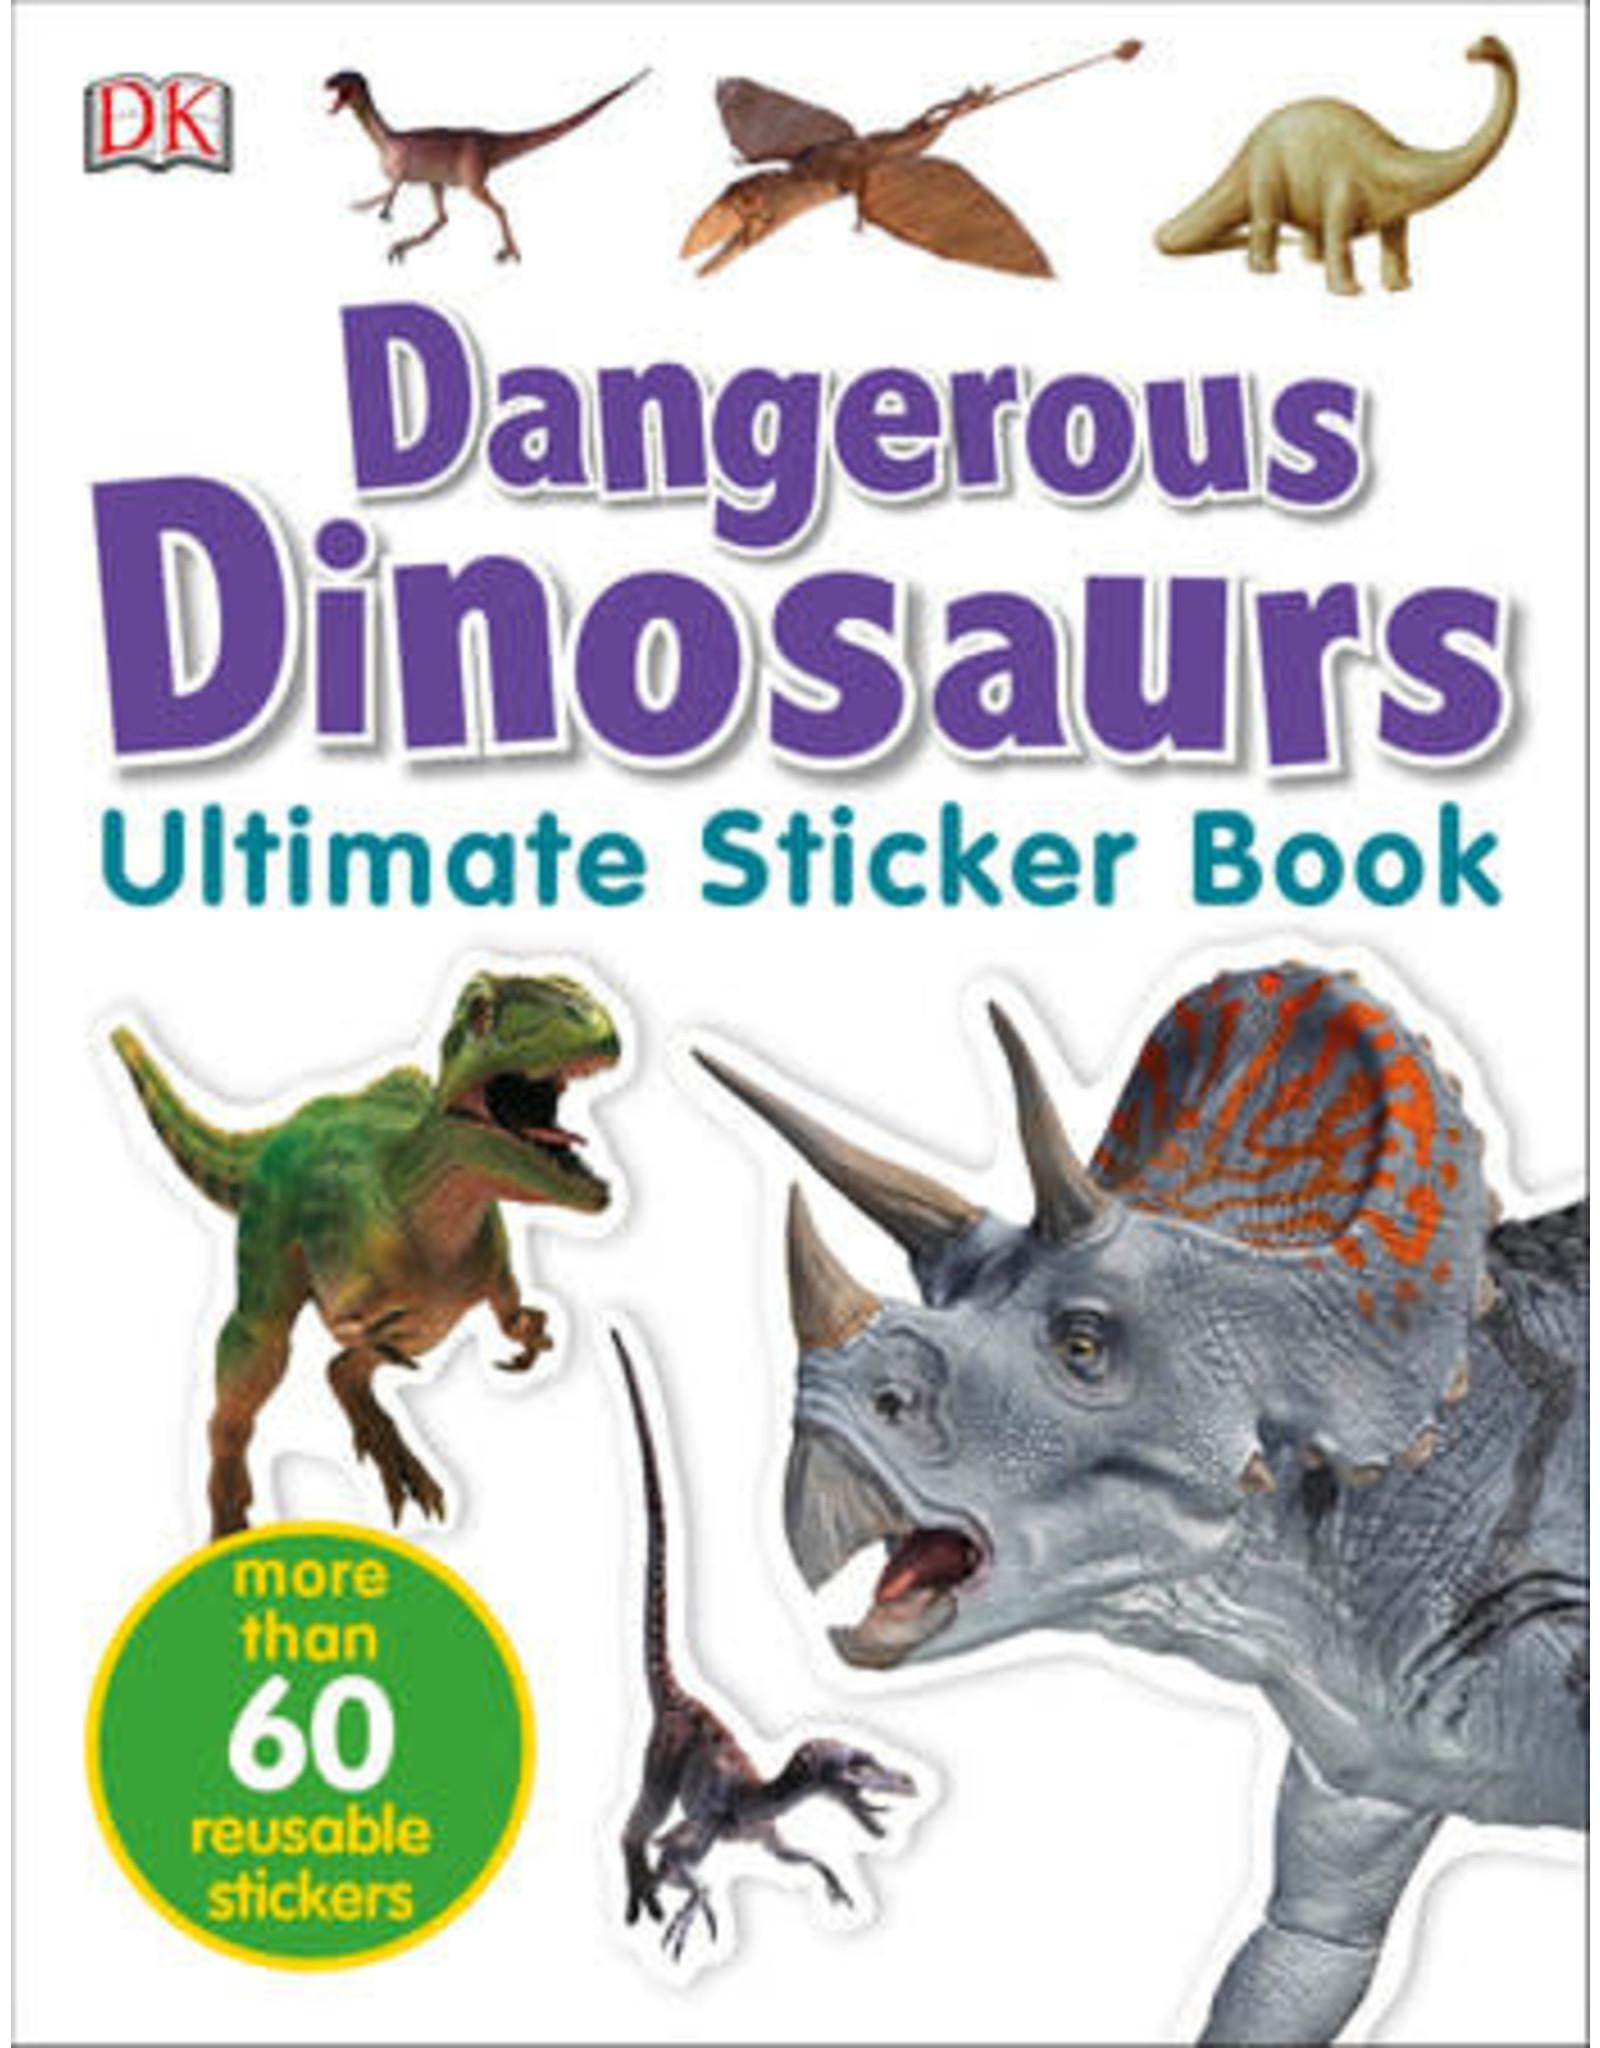 DK Dangerous Dinosaurs Ultimate Sticker Book